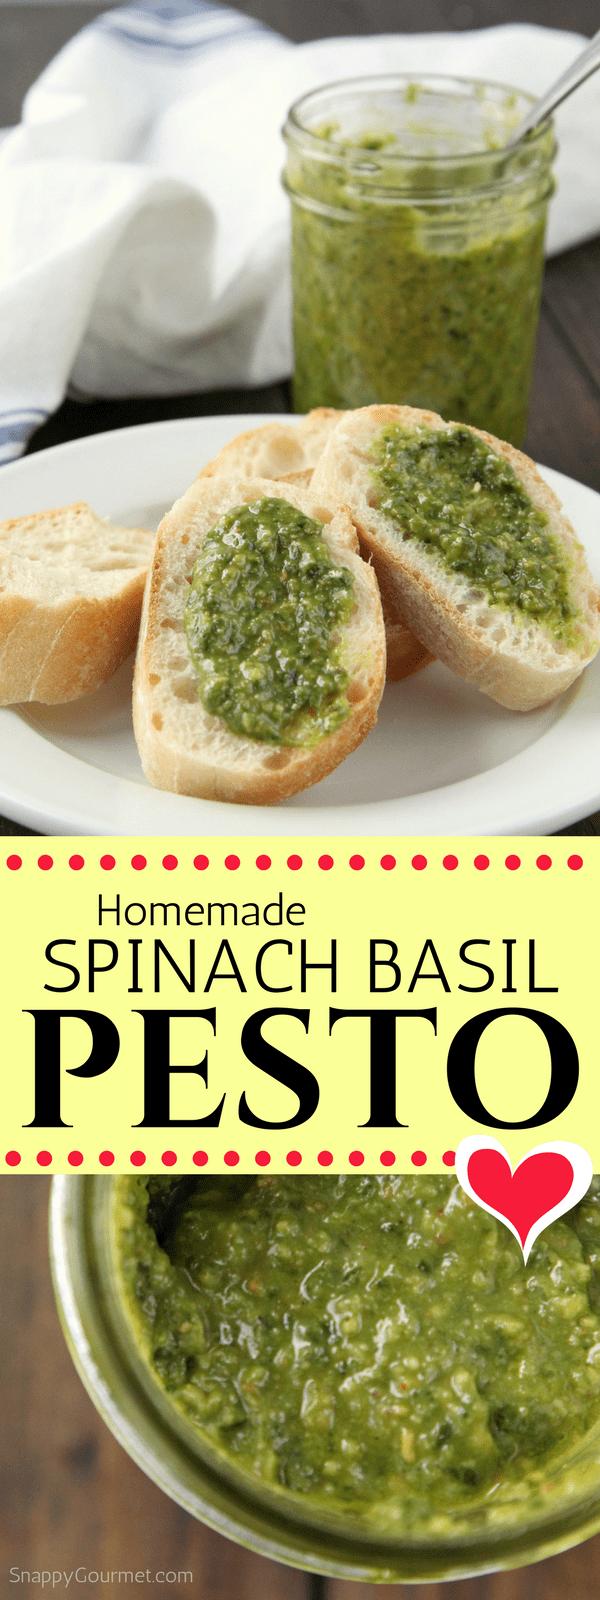 Homemade Spinach Basil Pesto Recipe - how to make homemade pesto in a blender of vitamix